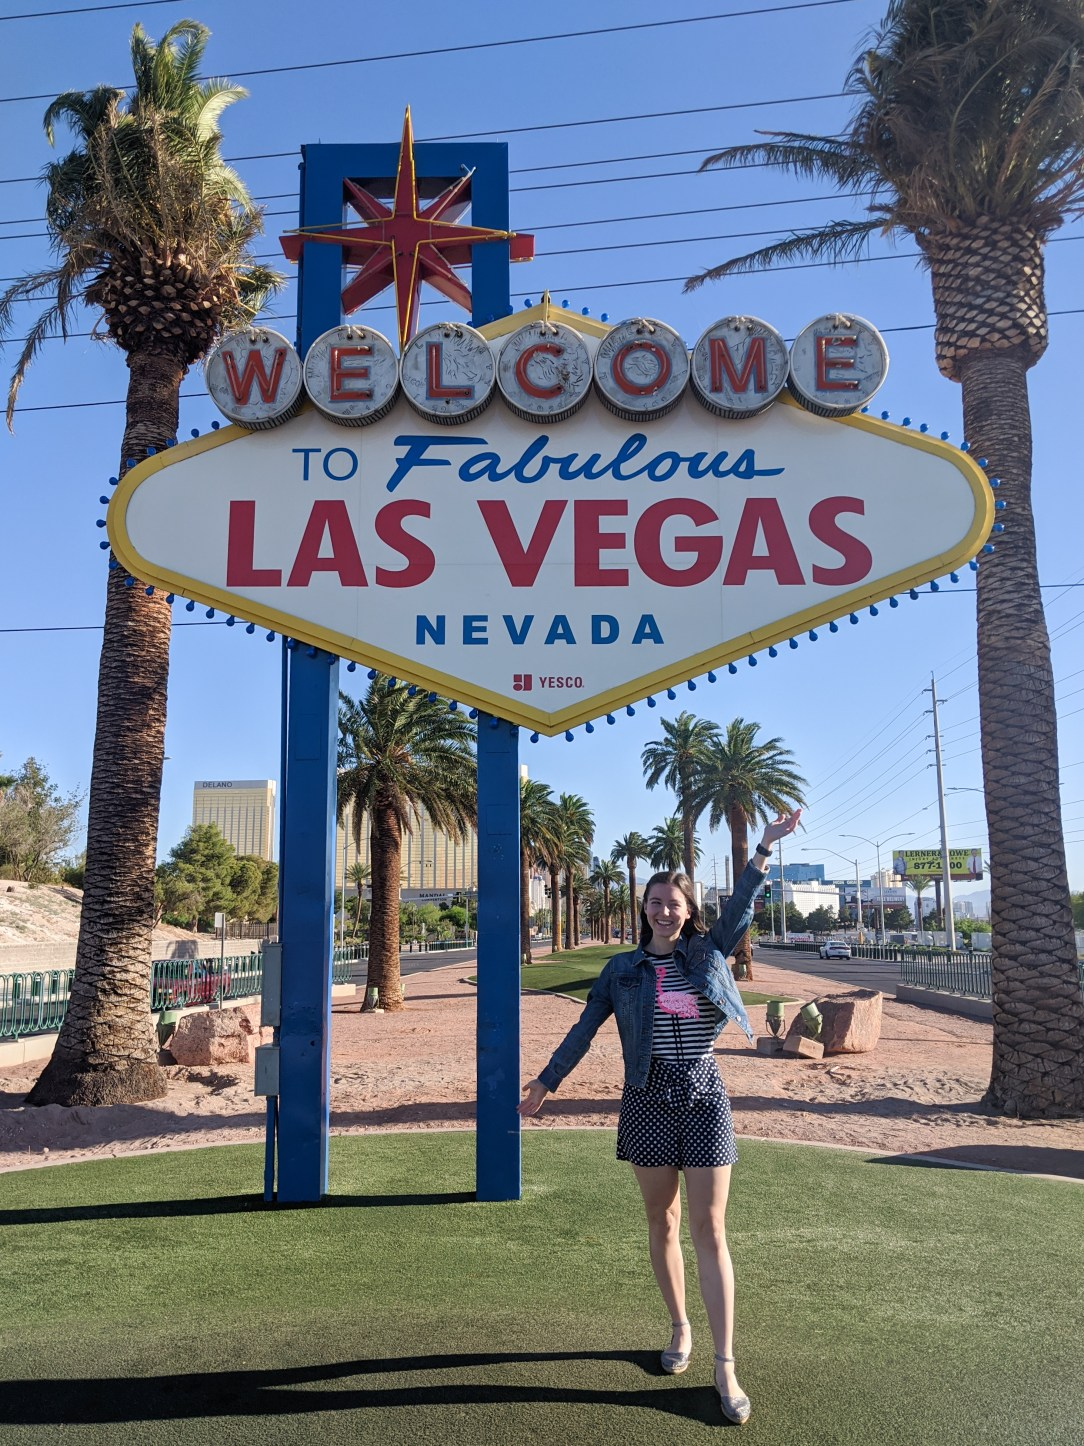 las-vegas-sign-tourist-attractions-social-distancing